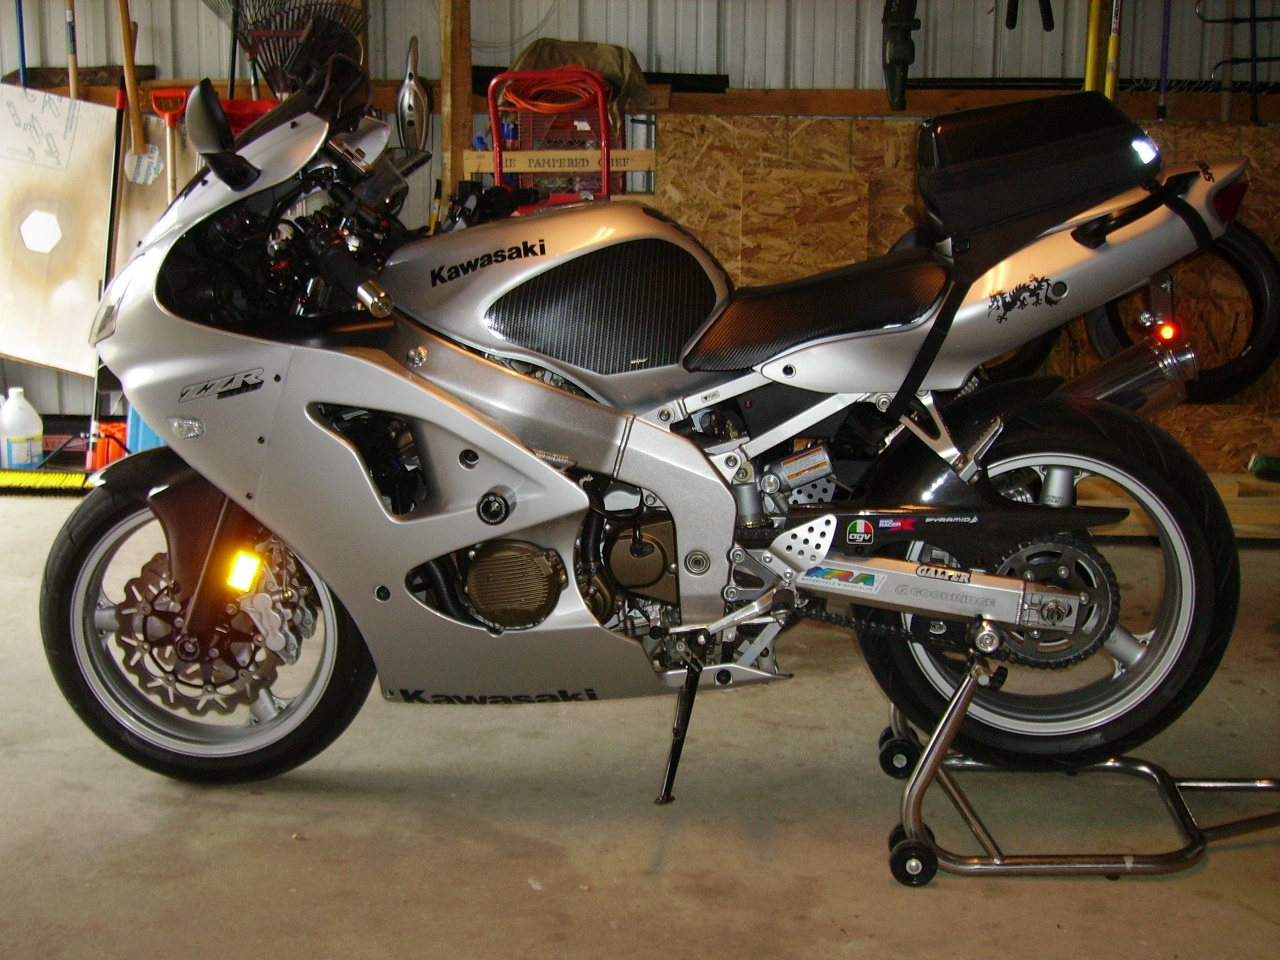 Show Off Your Zzr600 Page 142 Sportbikes Net